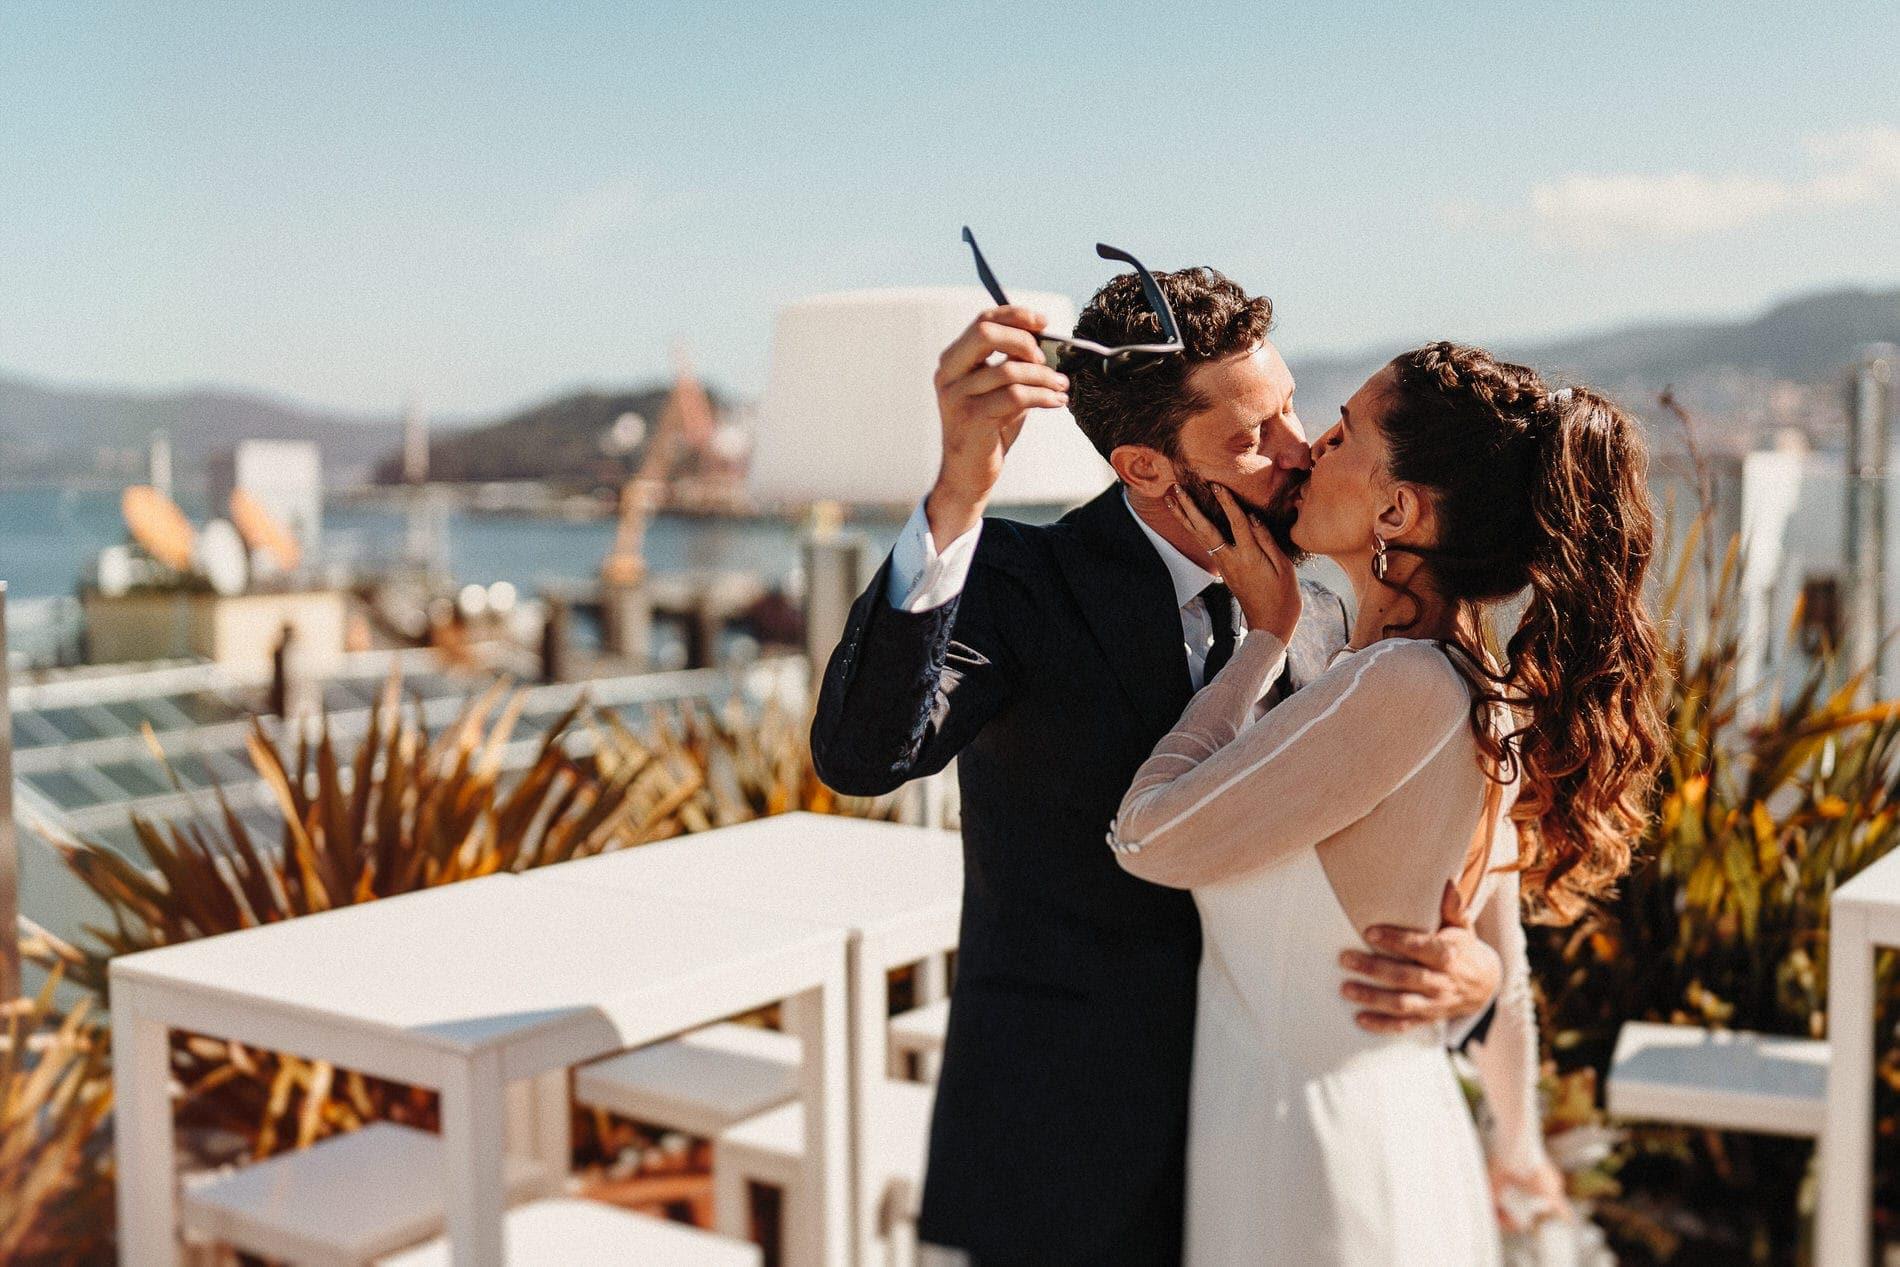 Galicia: La boda en Pepe Vieira con Lore & Paúl